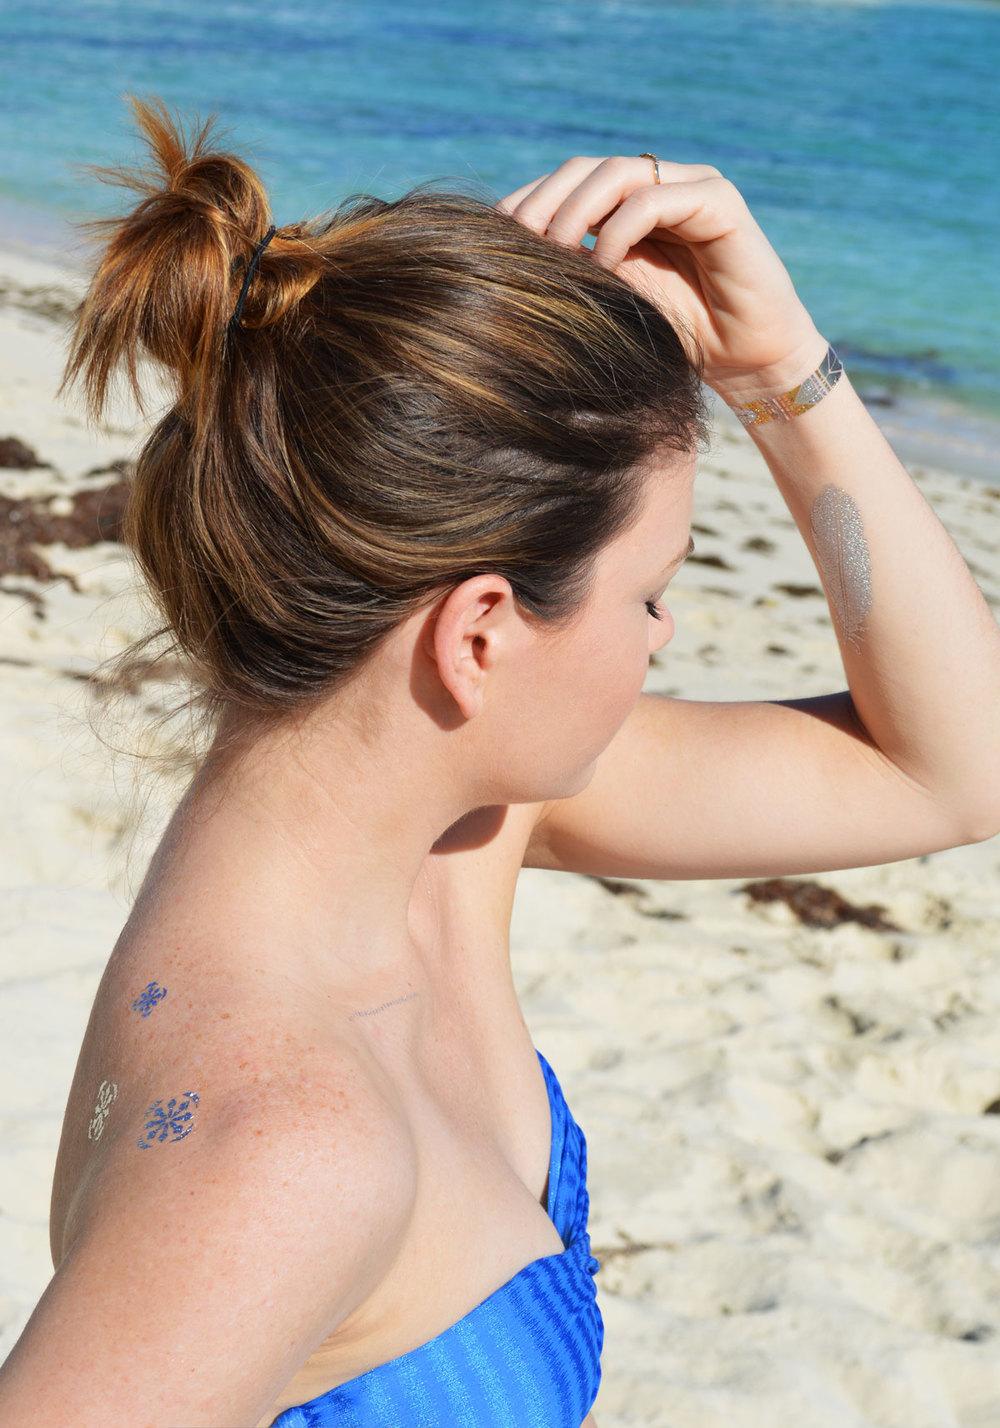 morning-coffee-lifestyle-blogger-nassau-bahamas-flash-tattoos-shine-on-miami-mia-marcelle-bikini-2014.jpeg